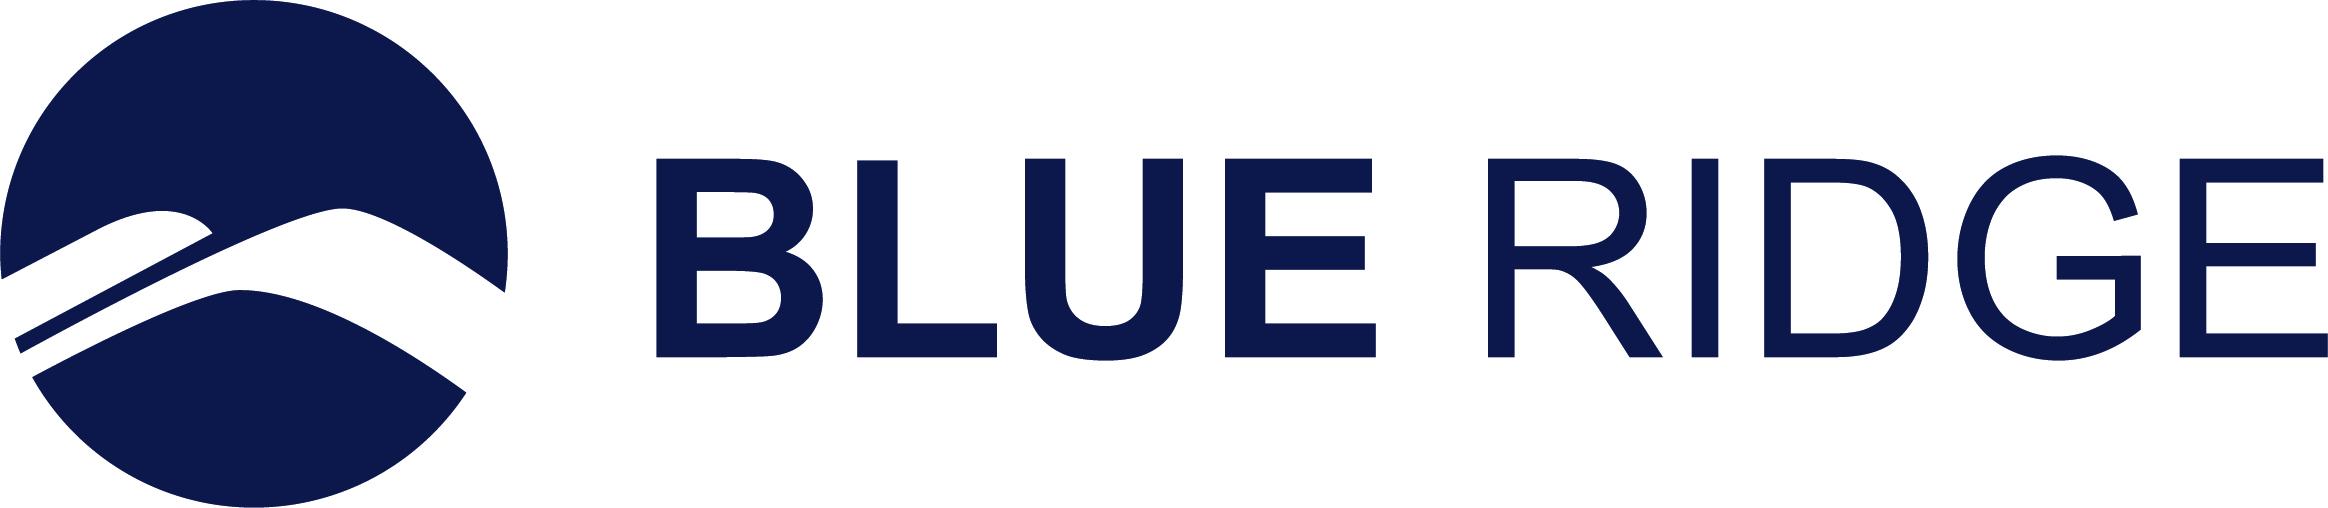 Blue Ridge Price Optimization Profiled in Evolving Enterprise Magazine